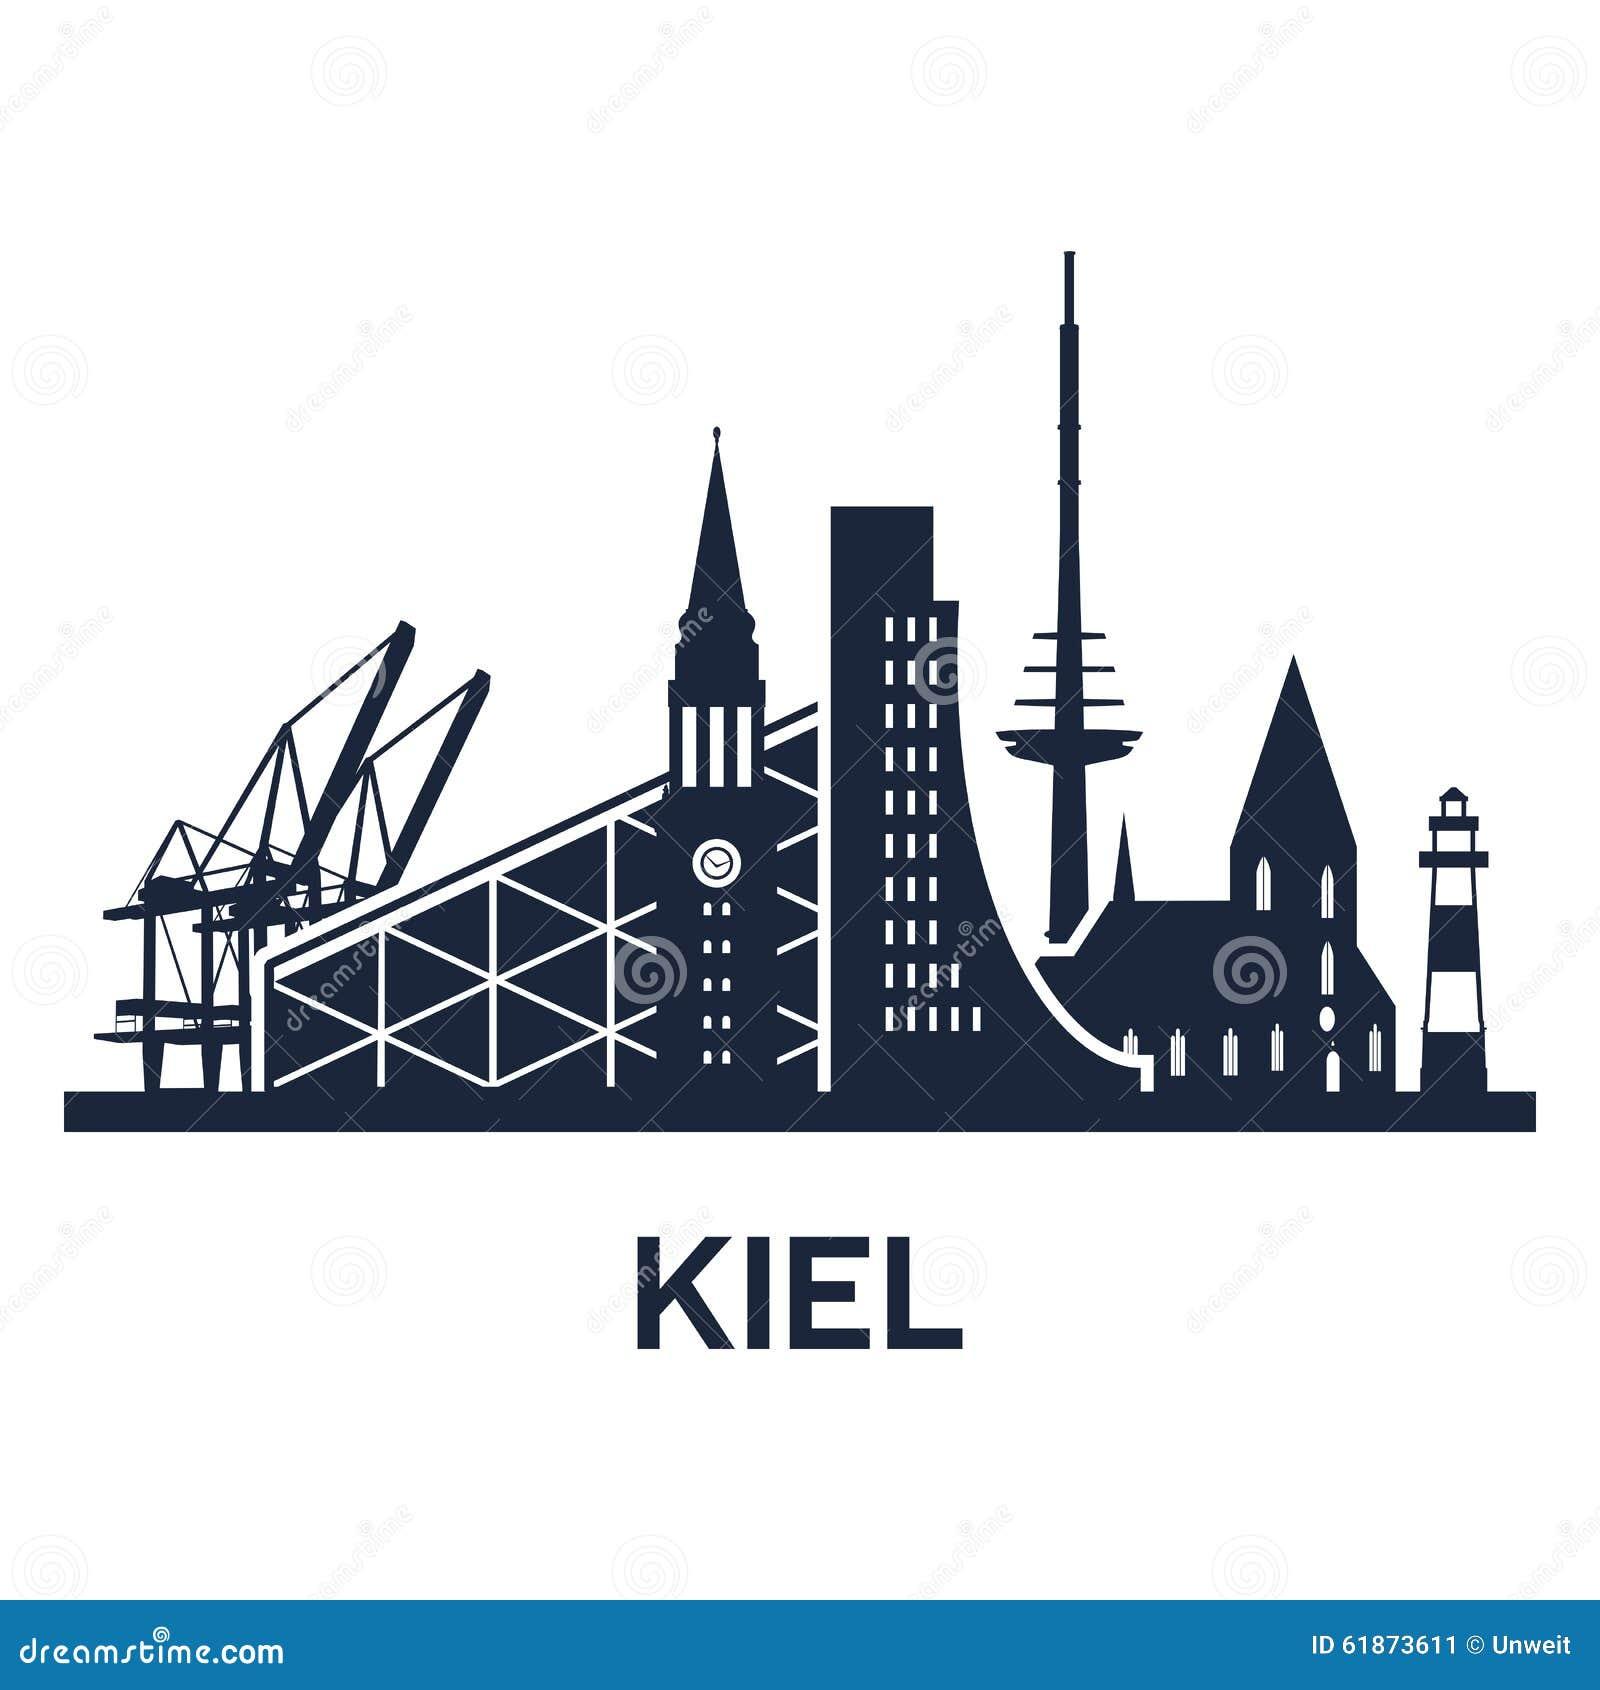 kiel city skyline vektor abbildung illustration von. Black Bedroom Furniture Sets. Home Design Ideas